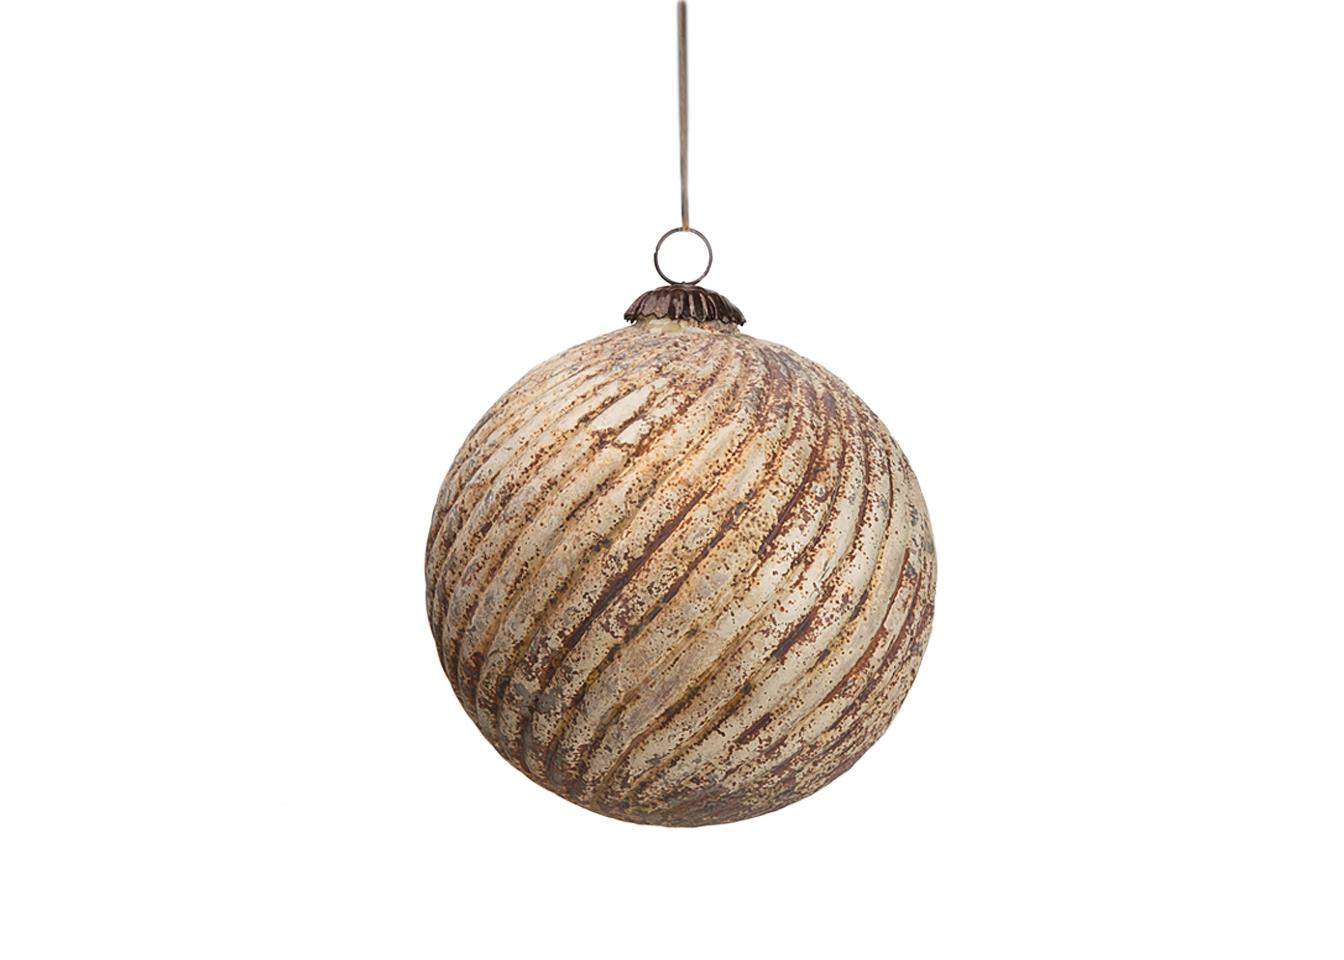 Roomers Новогодняя игрушка шар